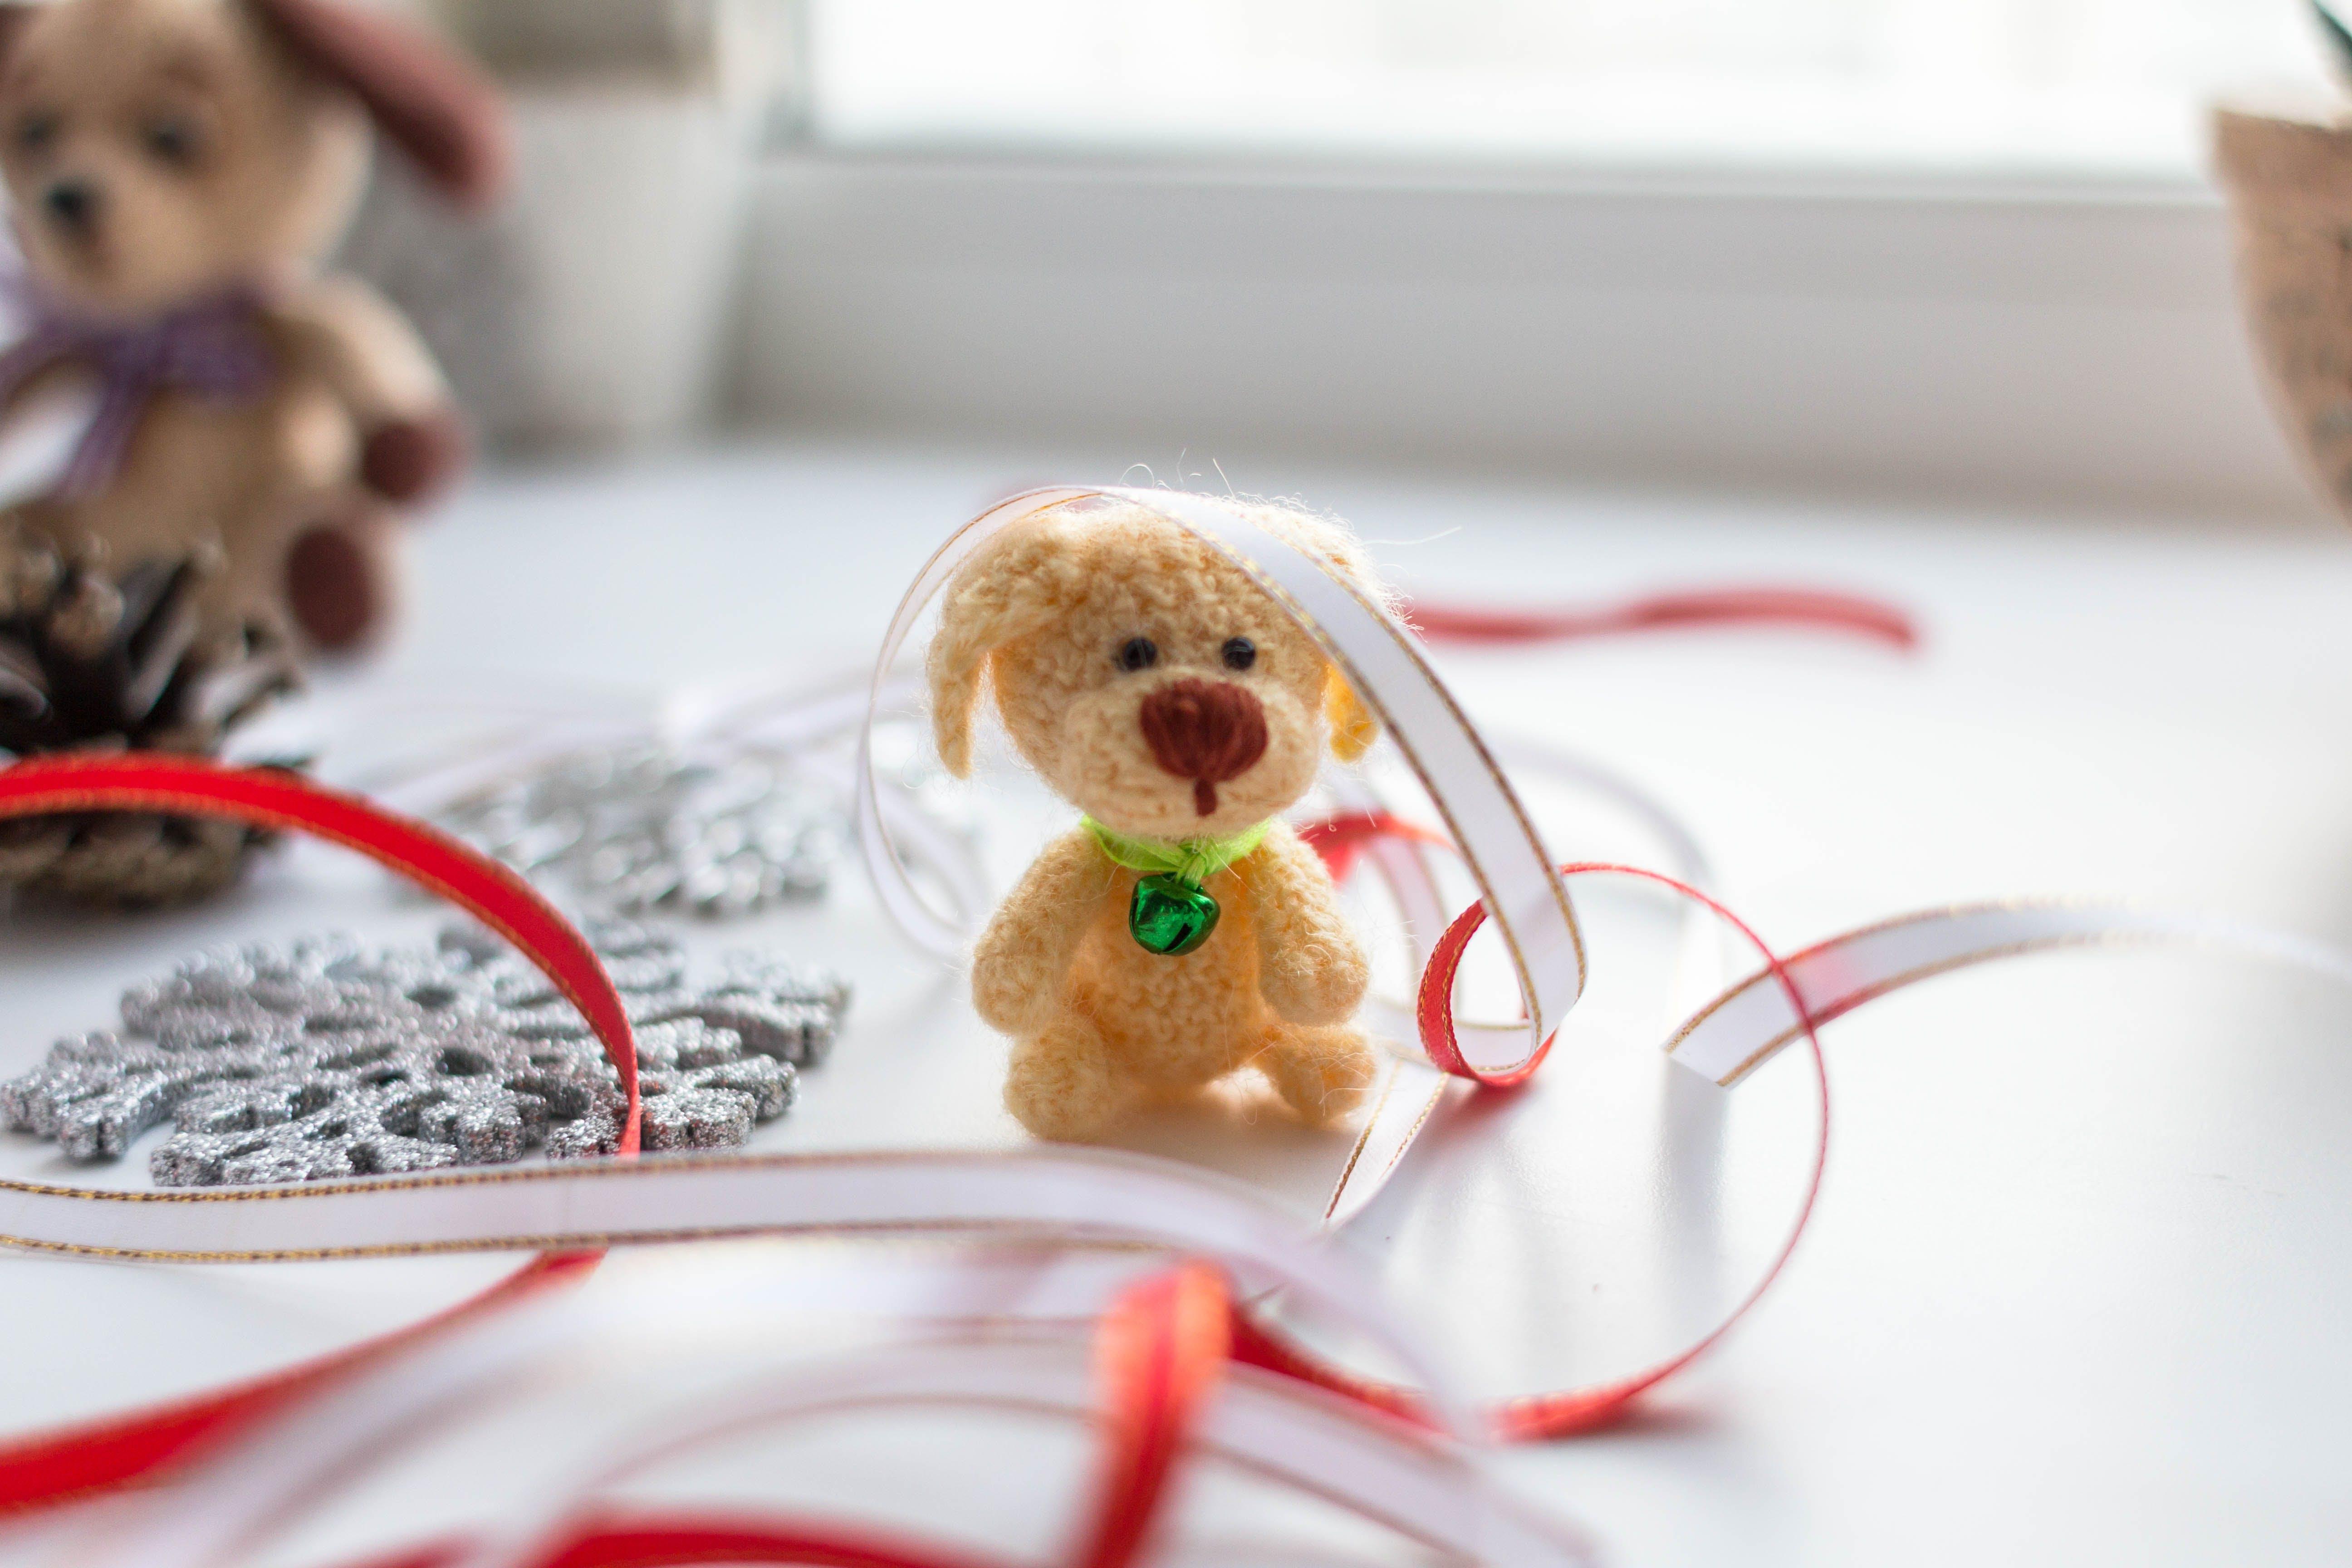 Free stock photo of instagram - @almazka_hm #Toys #Handmade